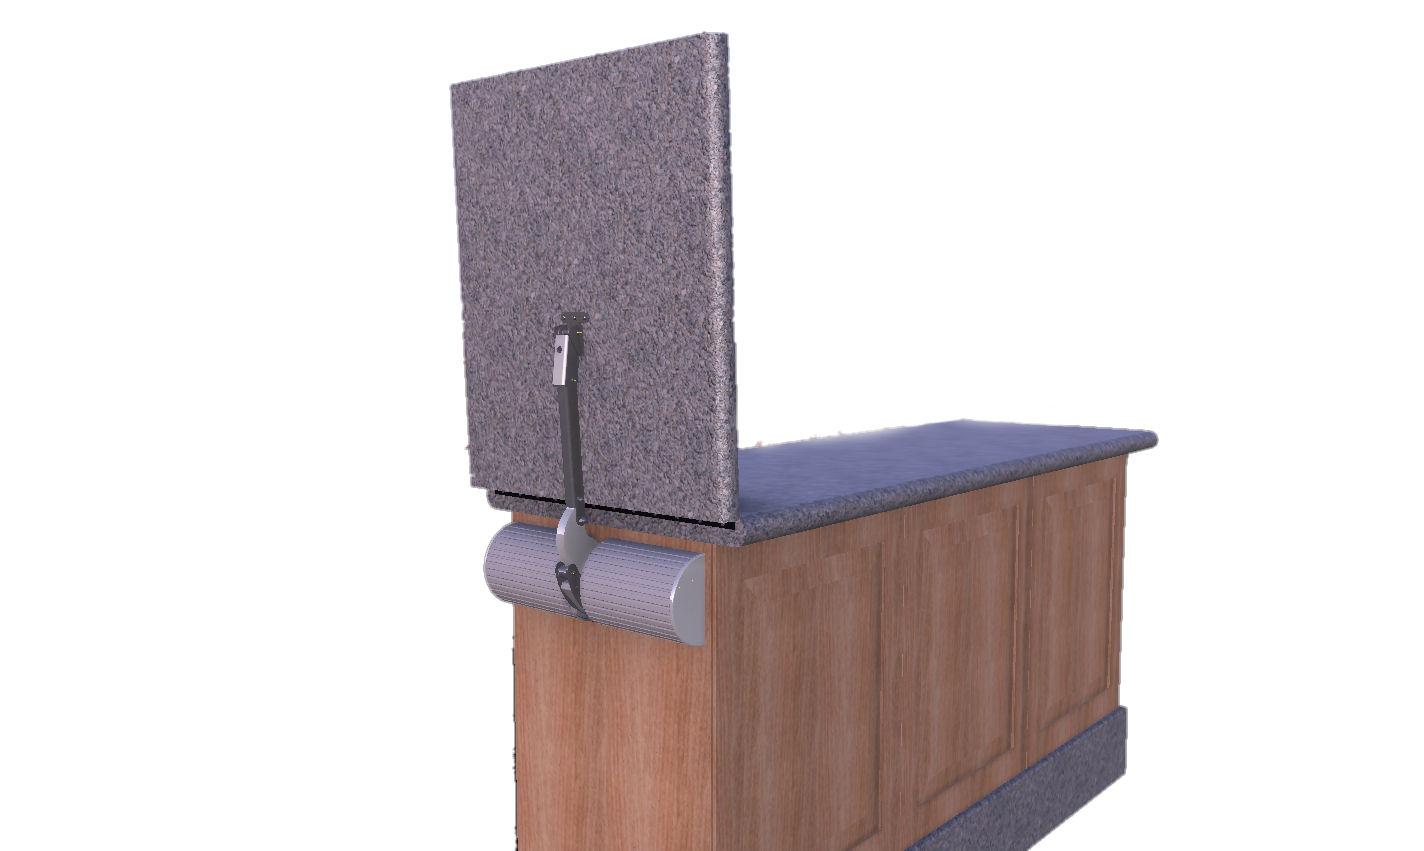 Lift-A-SYST, counterbalance, countertop door, hinge, flip up counter ...